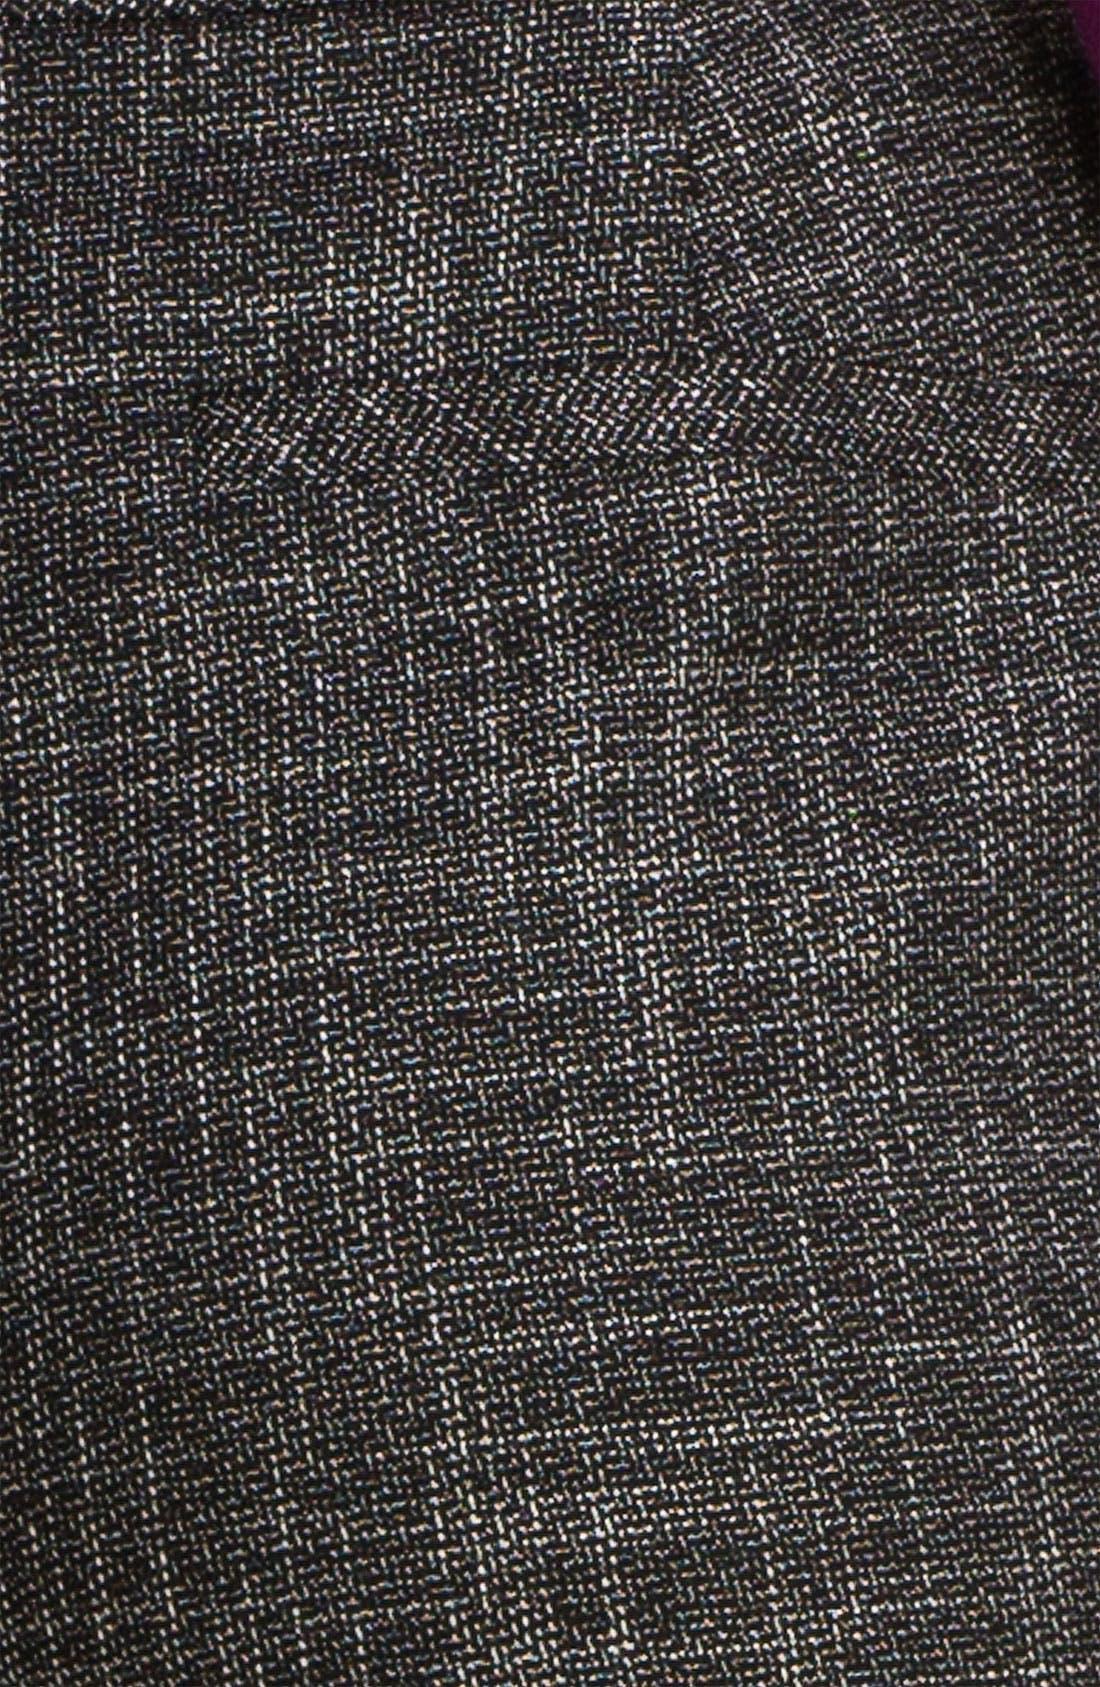 'Mystero Weave' Pants,                             Alternate thumbnail 2, color,                             001